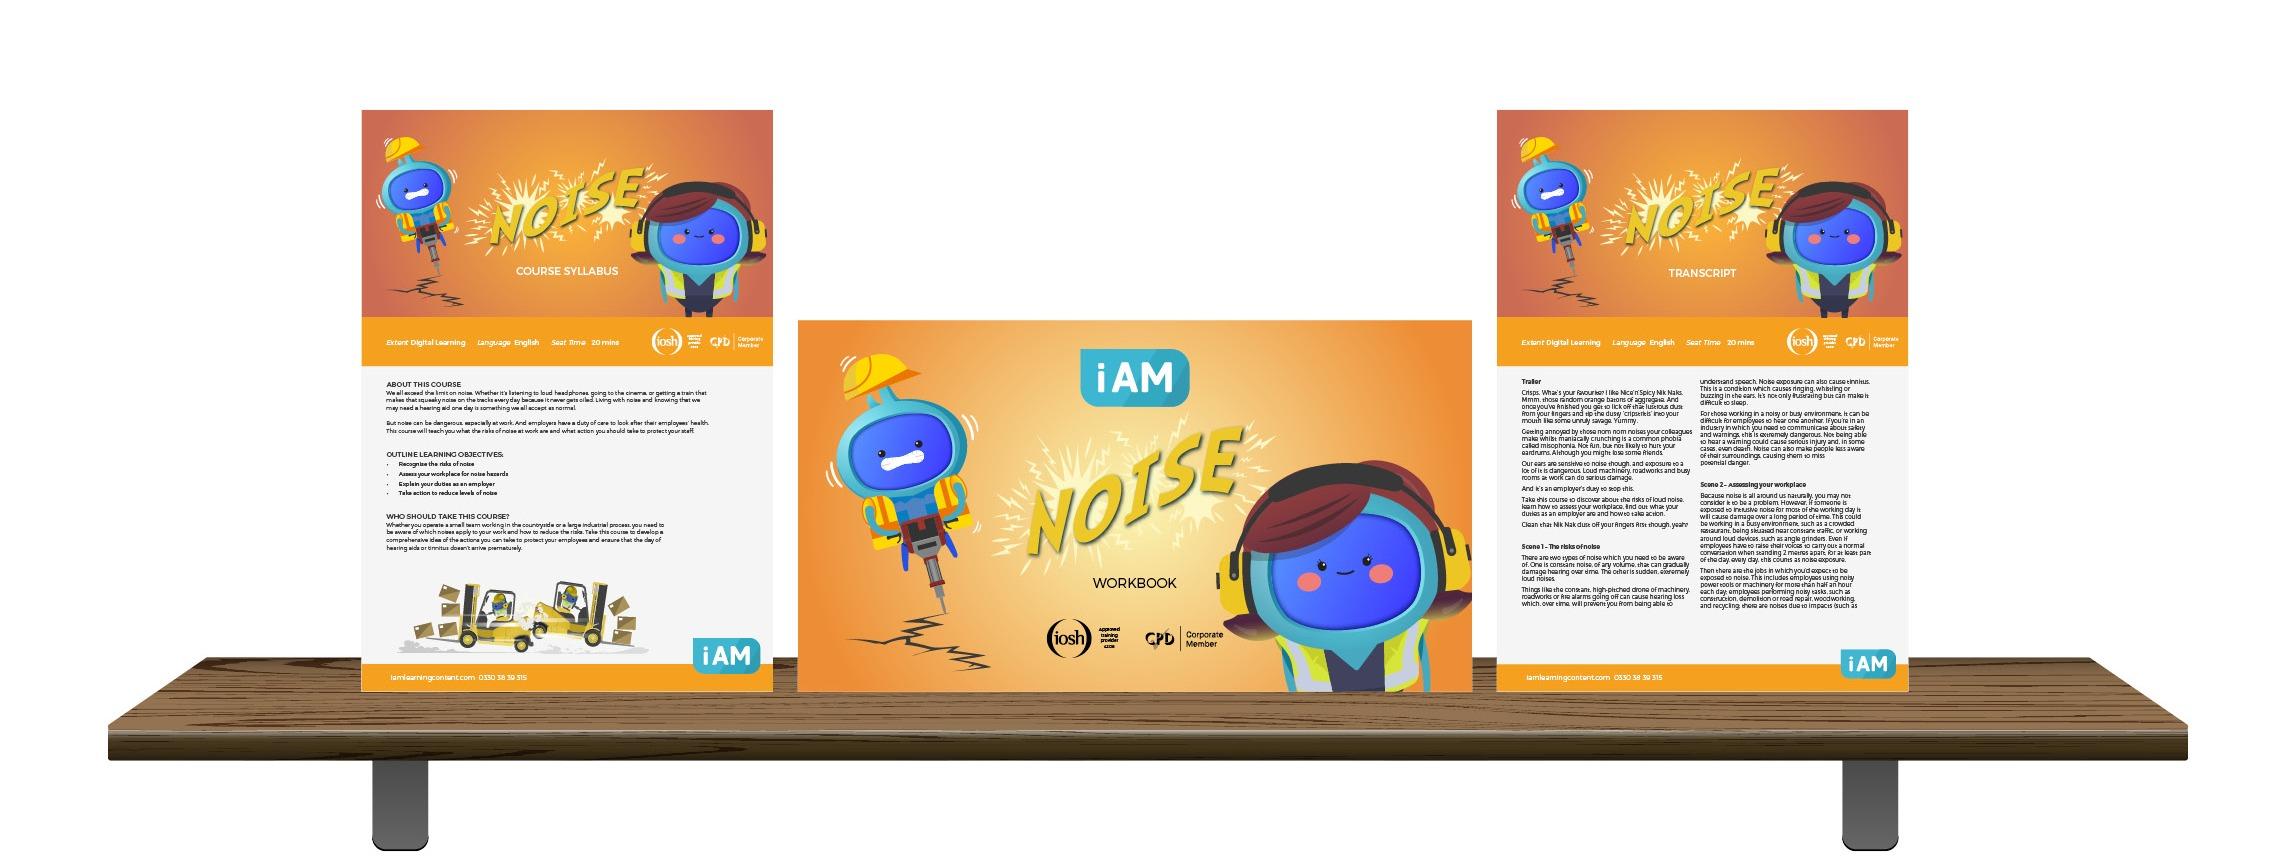 iAM 00033 - Noise - Landing Page8